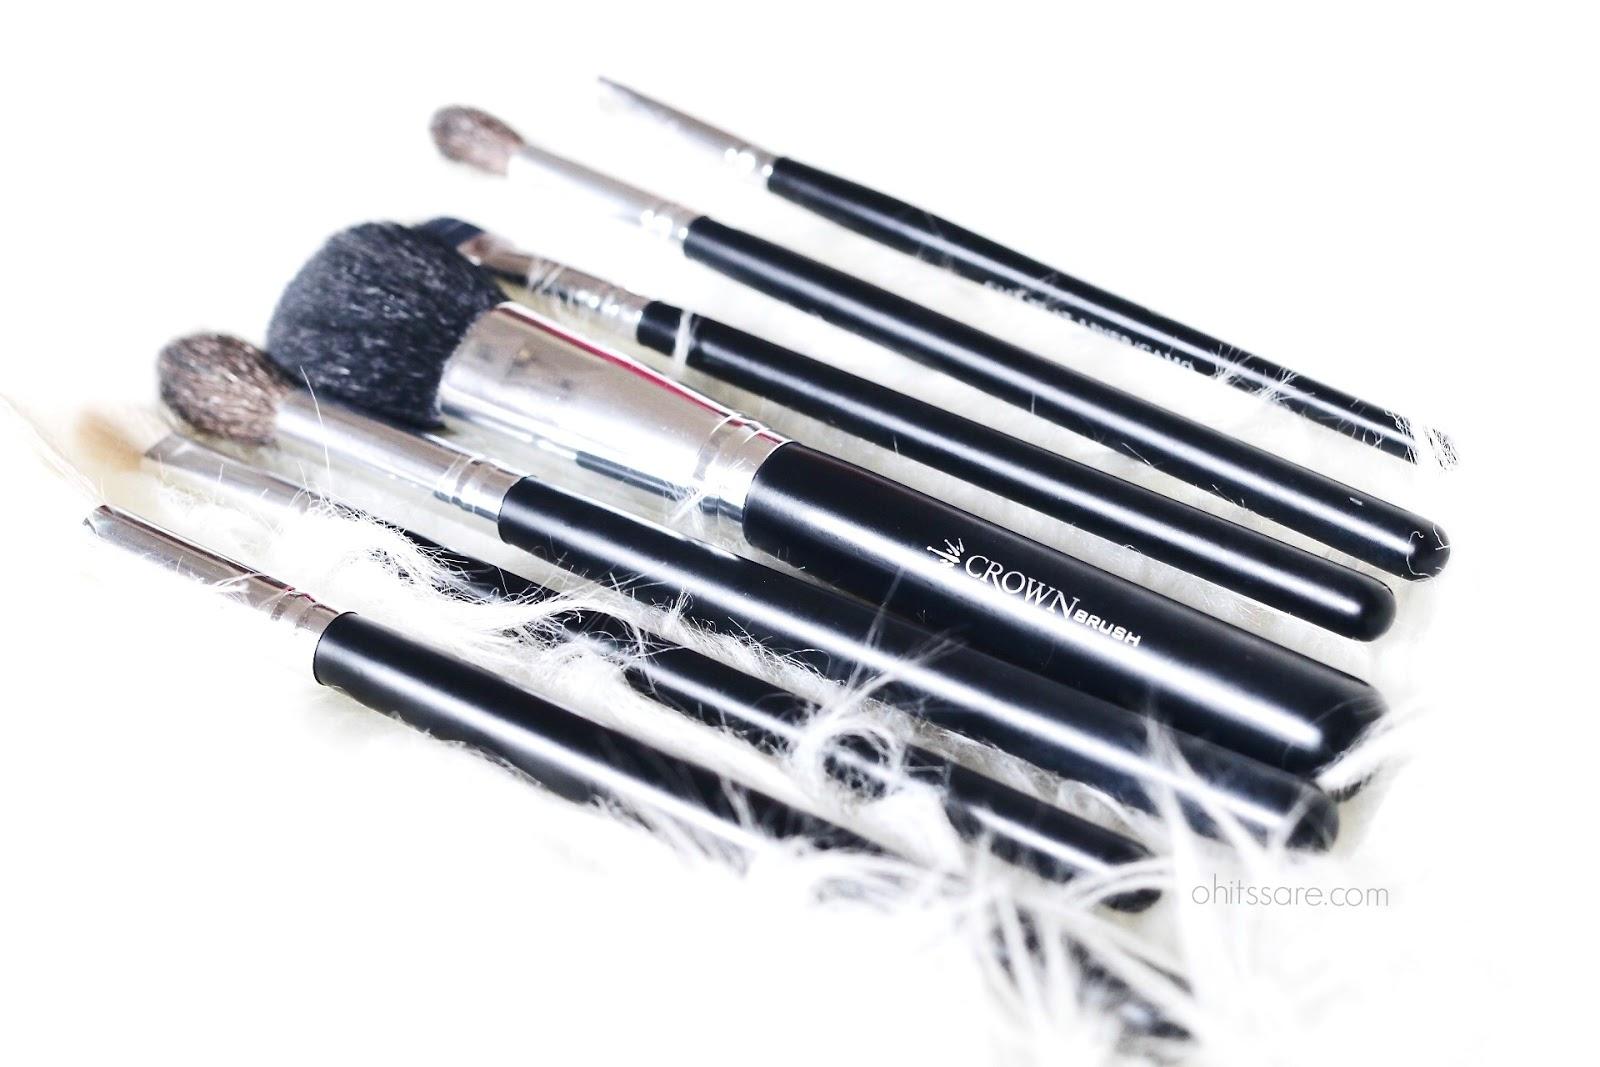 crown brushes,haul,review,eyeshadow,makeup brushes, highlight,contour,highlight & contour, crown brushes eyeshadow brushes,